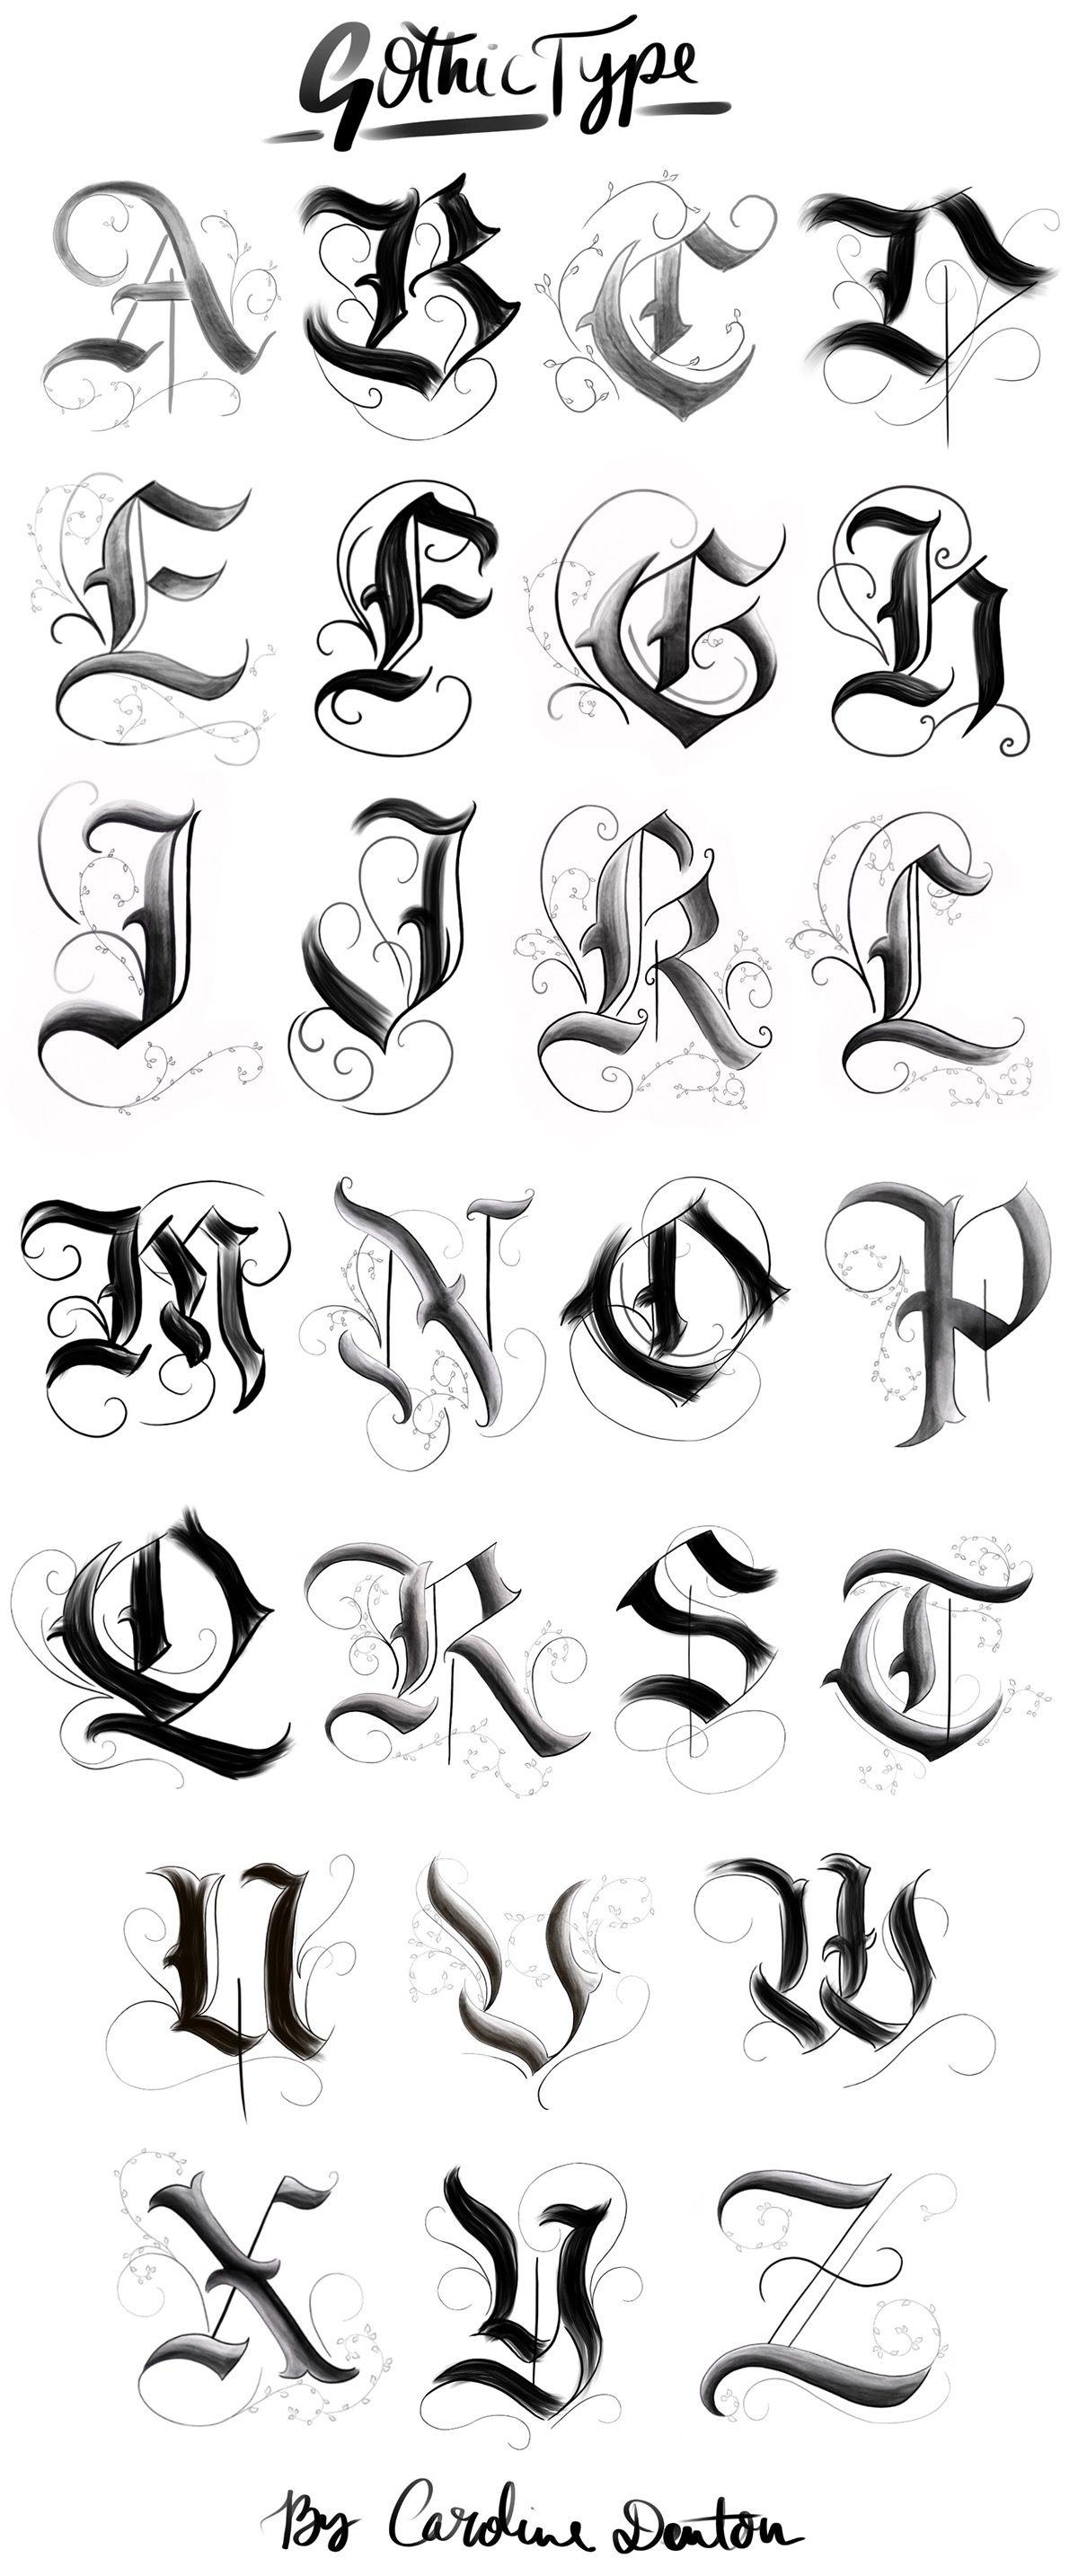 Gothic alphabet on behance tattoo lettering fonts tattoo fonts alphabet calligraphy letters alphabet